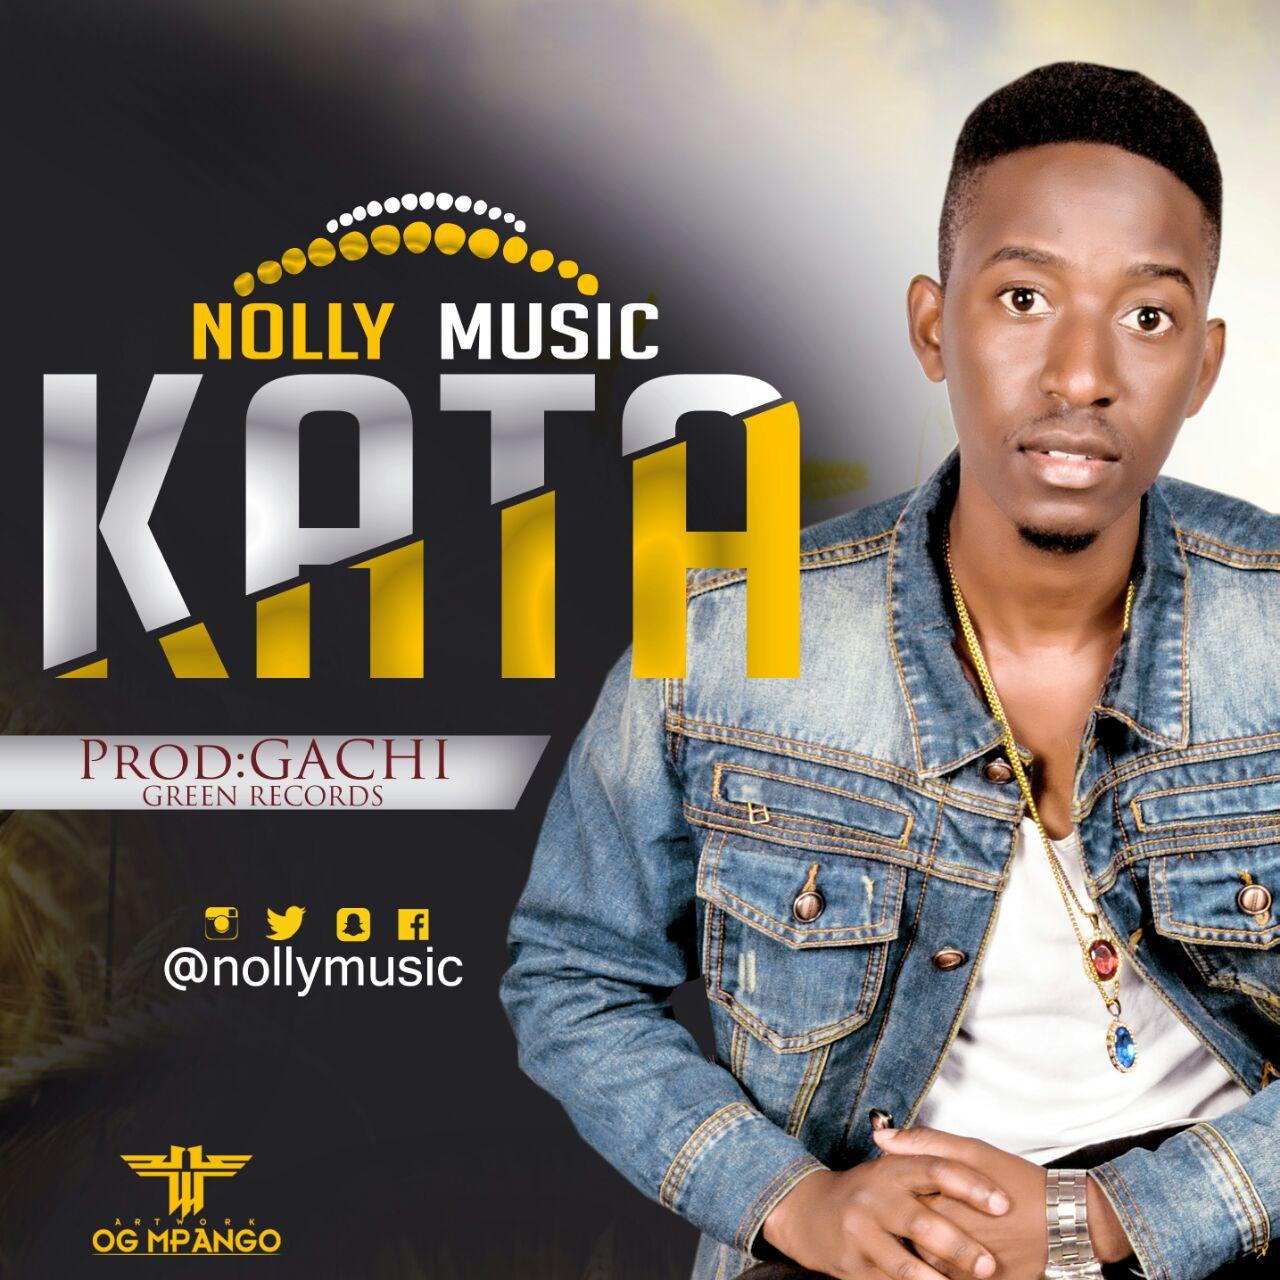 Nollymusic - KATA